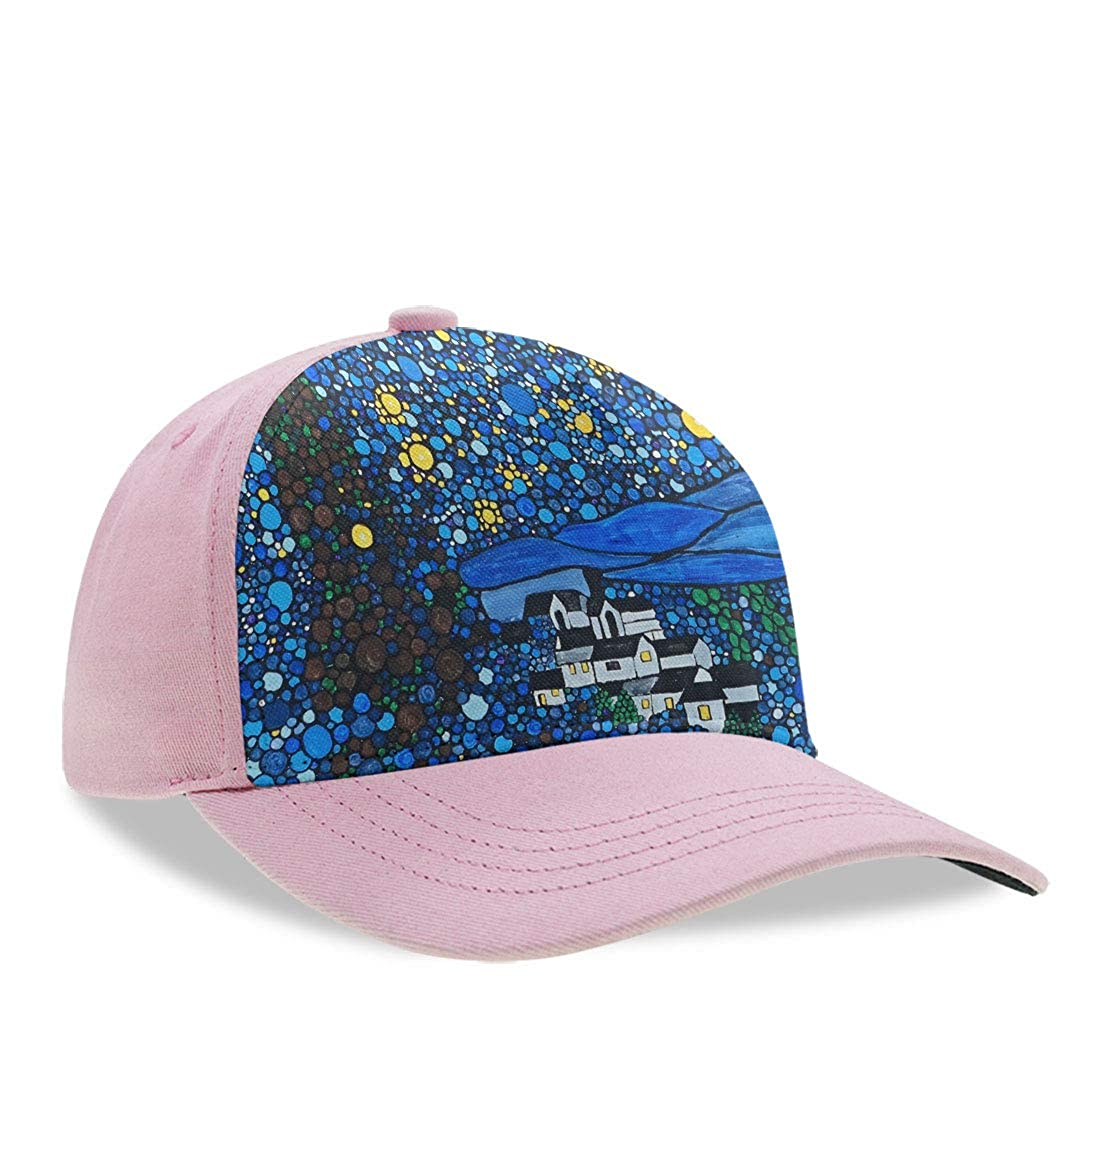 Men Women Baseball Cap Hip Pop Mudder Trucker Hat Snapback Cap Dad Hat